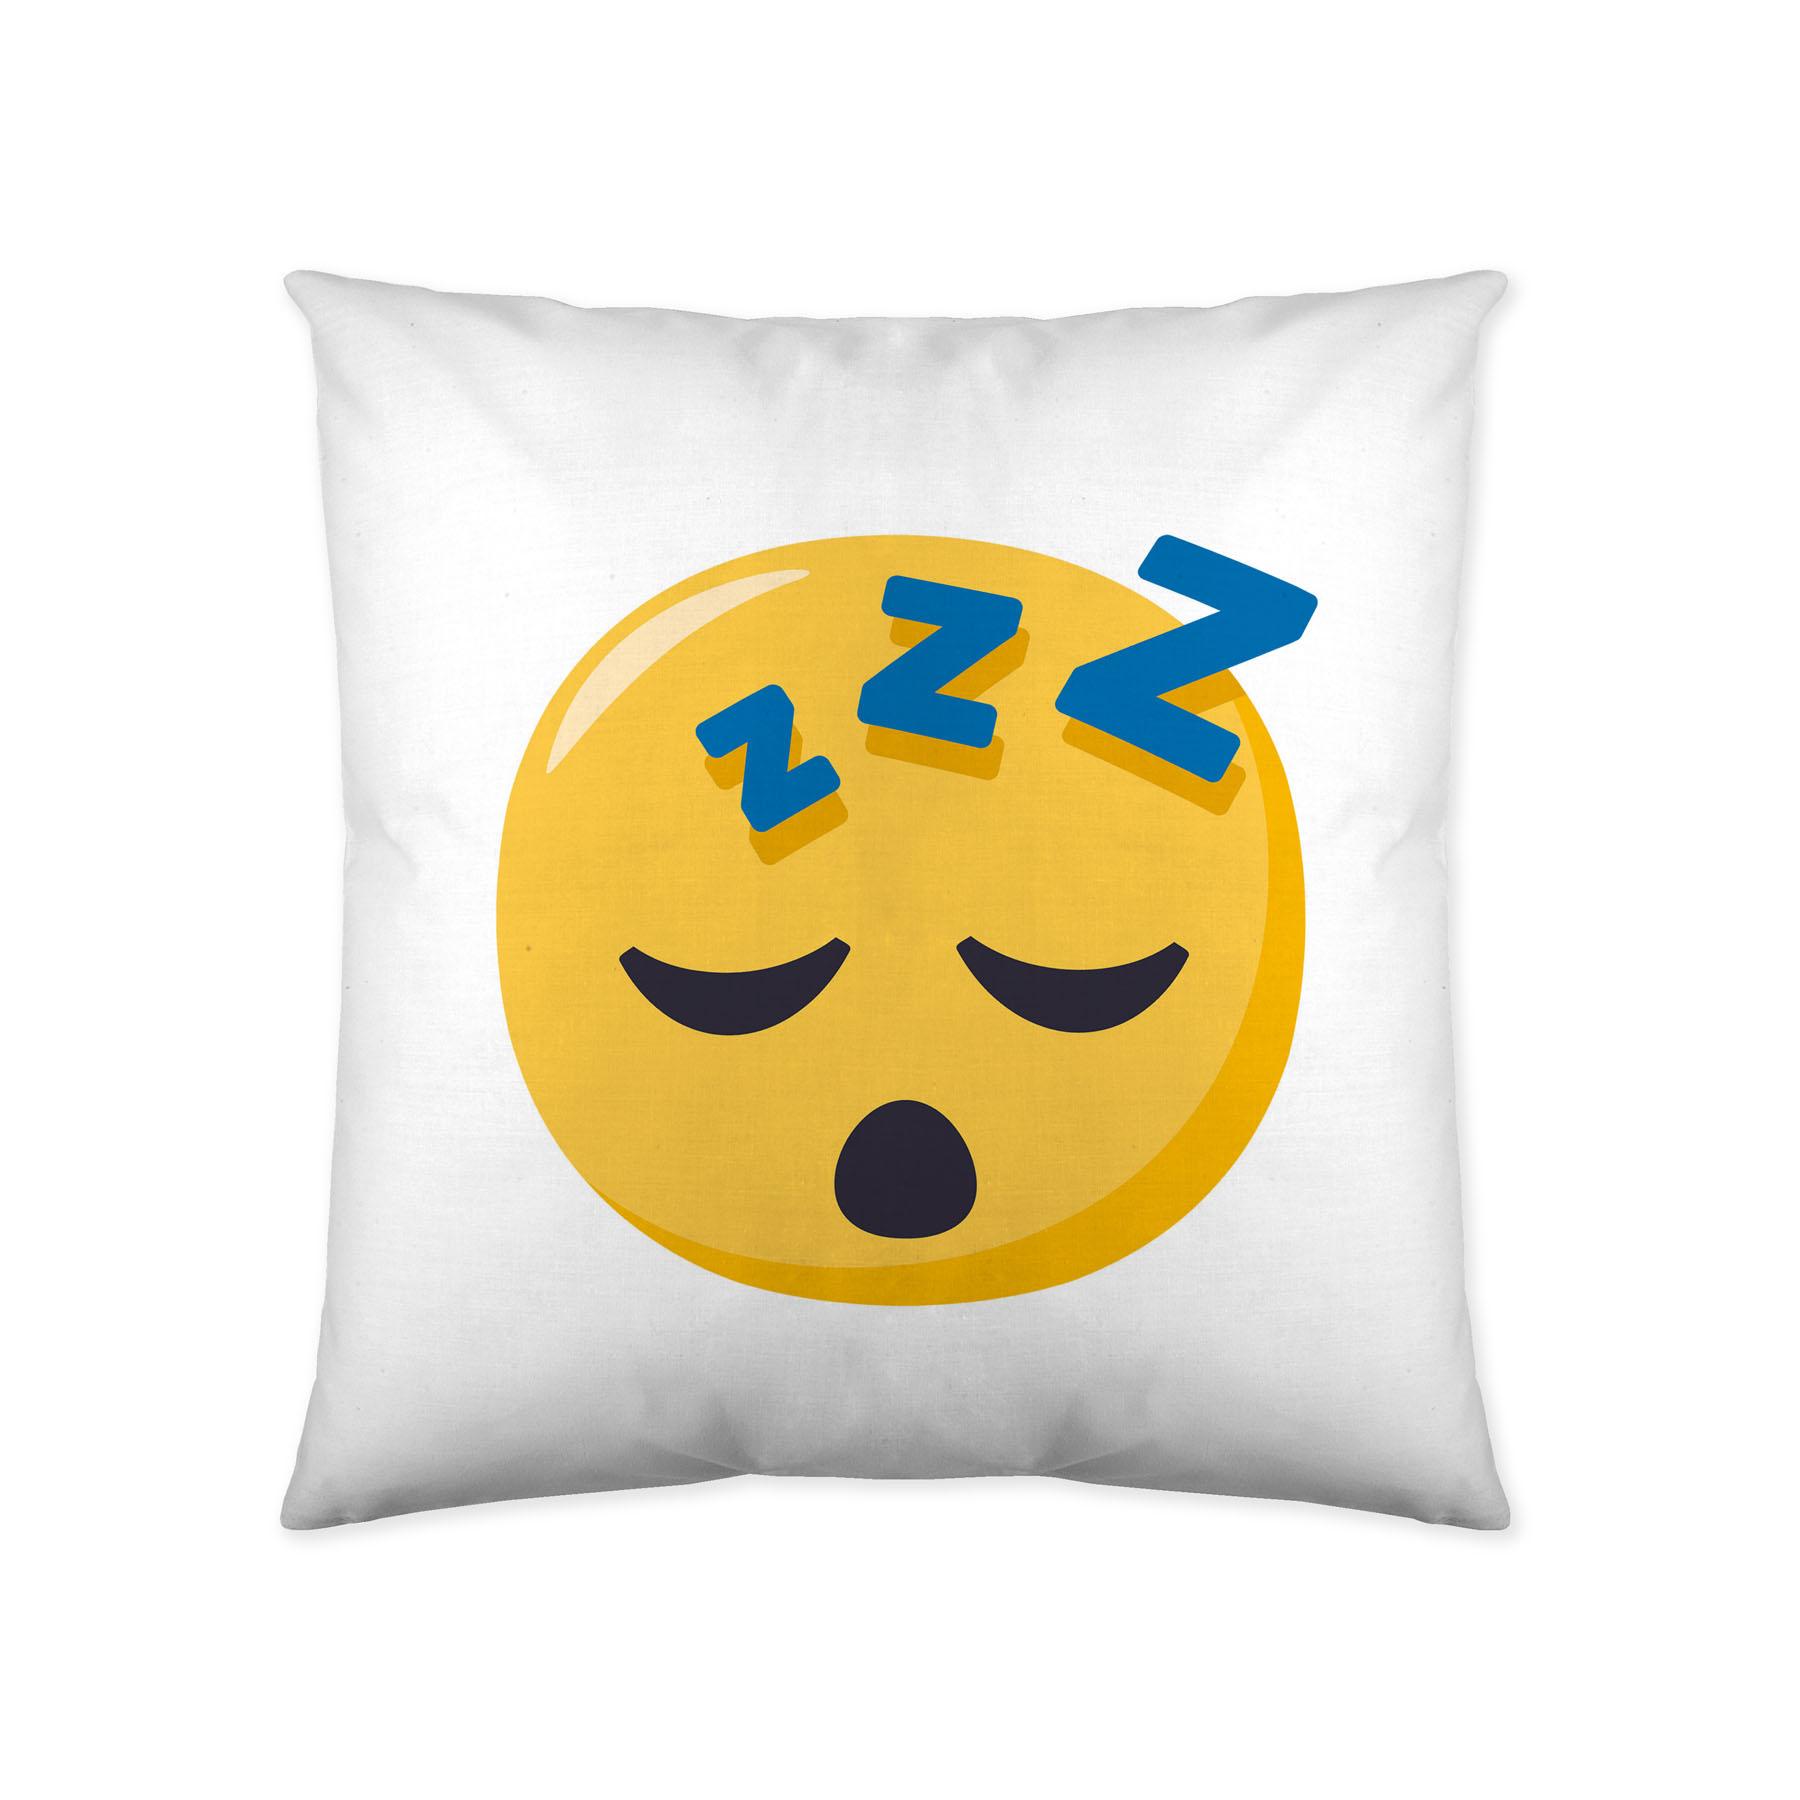 COJIN REVERSIBLE 5 JOY PIXELS EmojiOne 40 x 40 cms con relleno